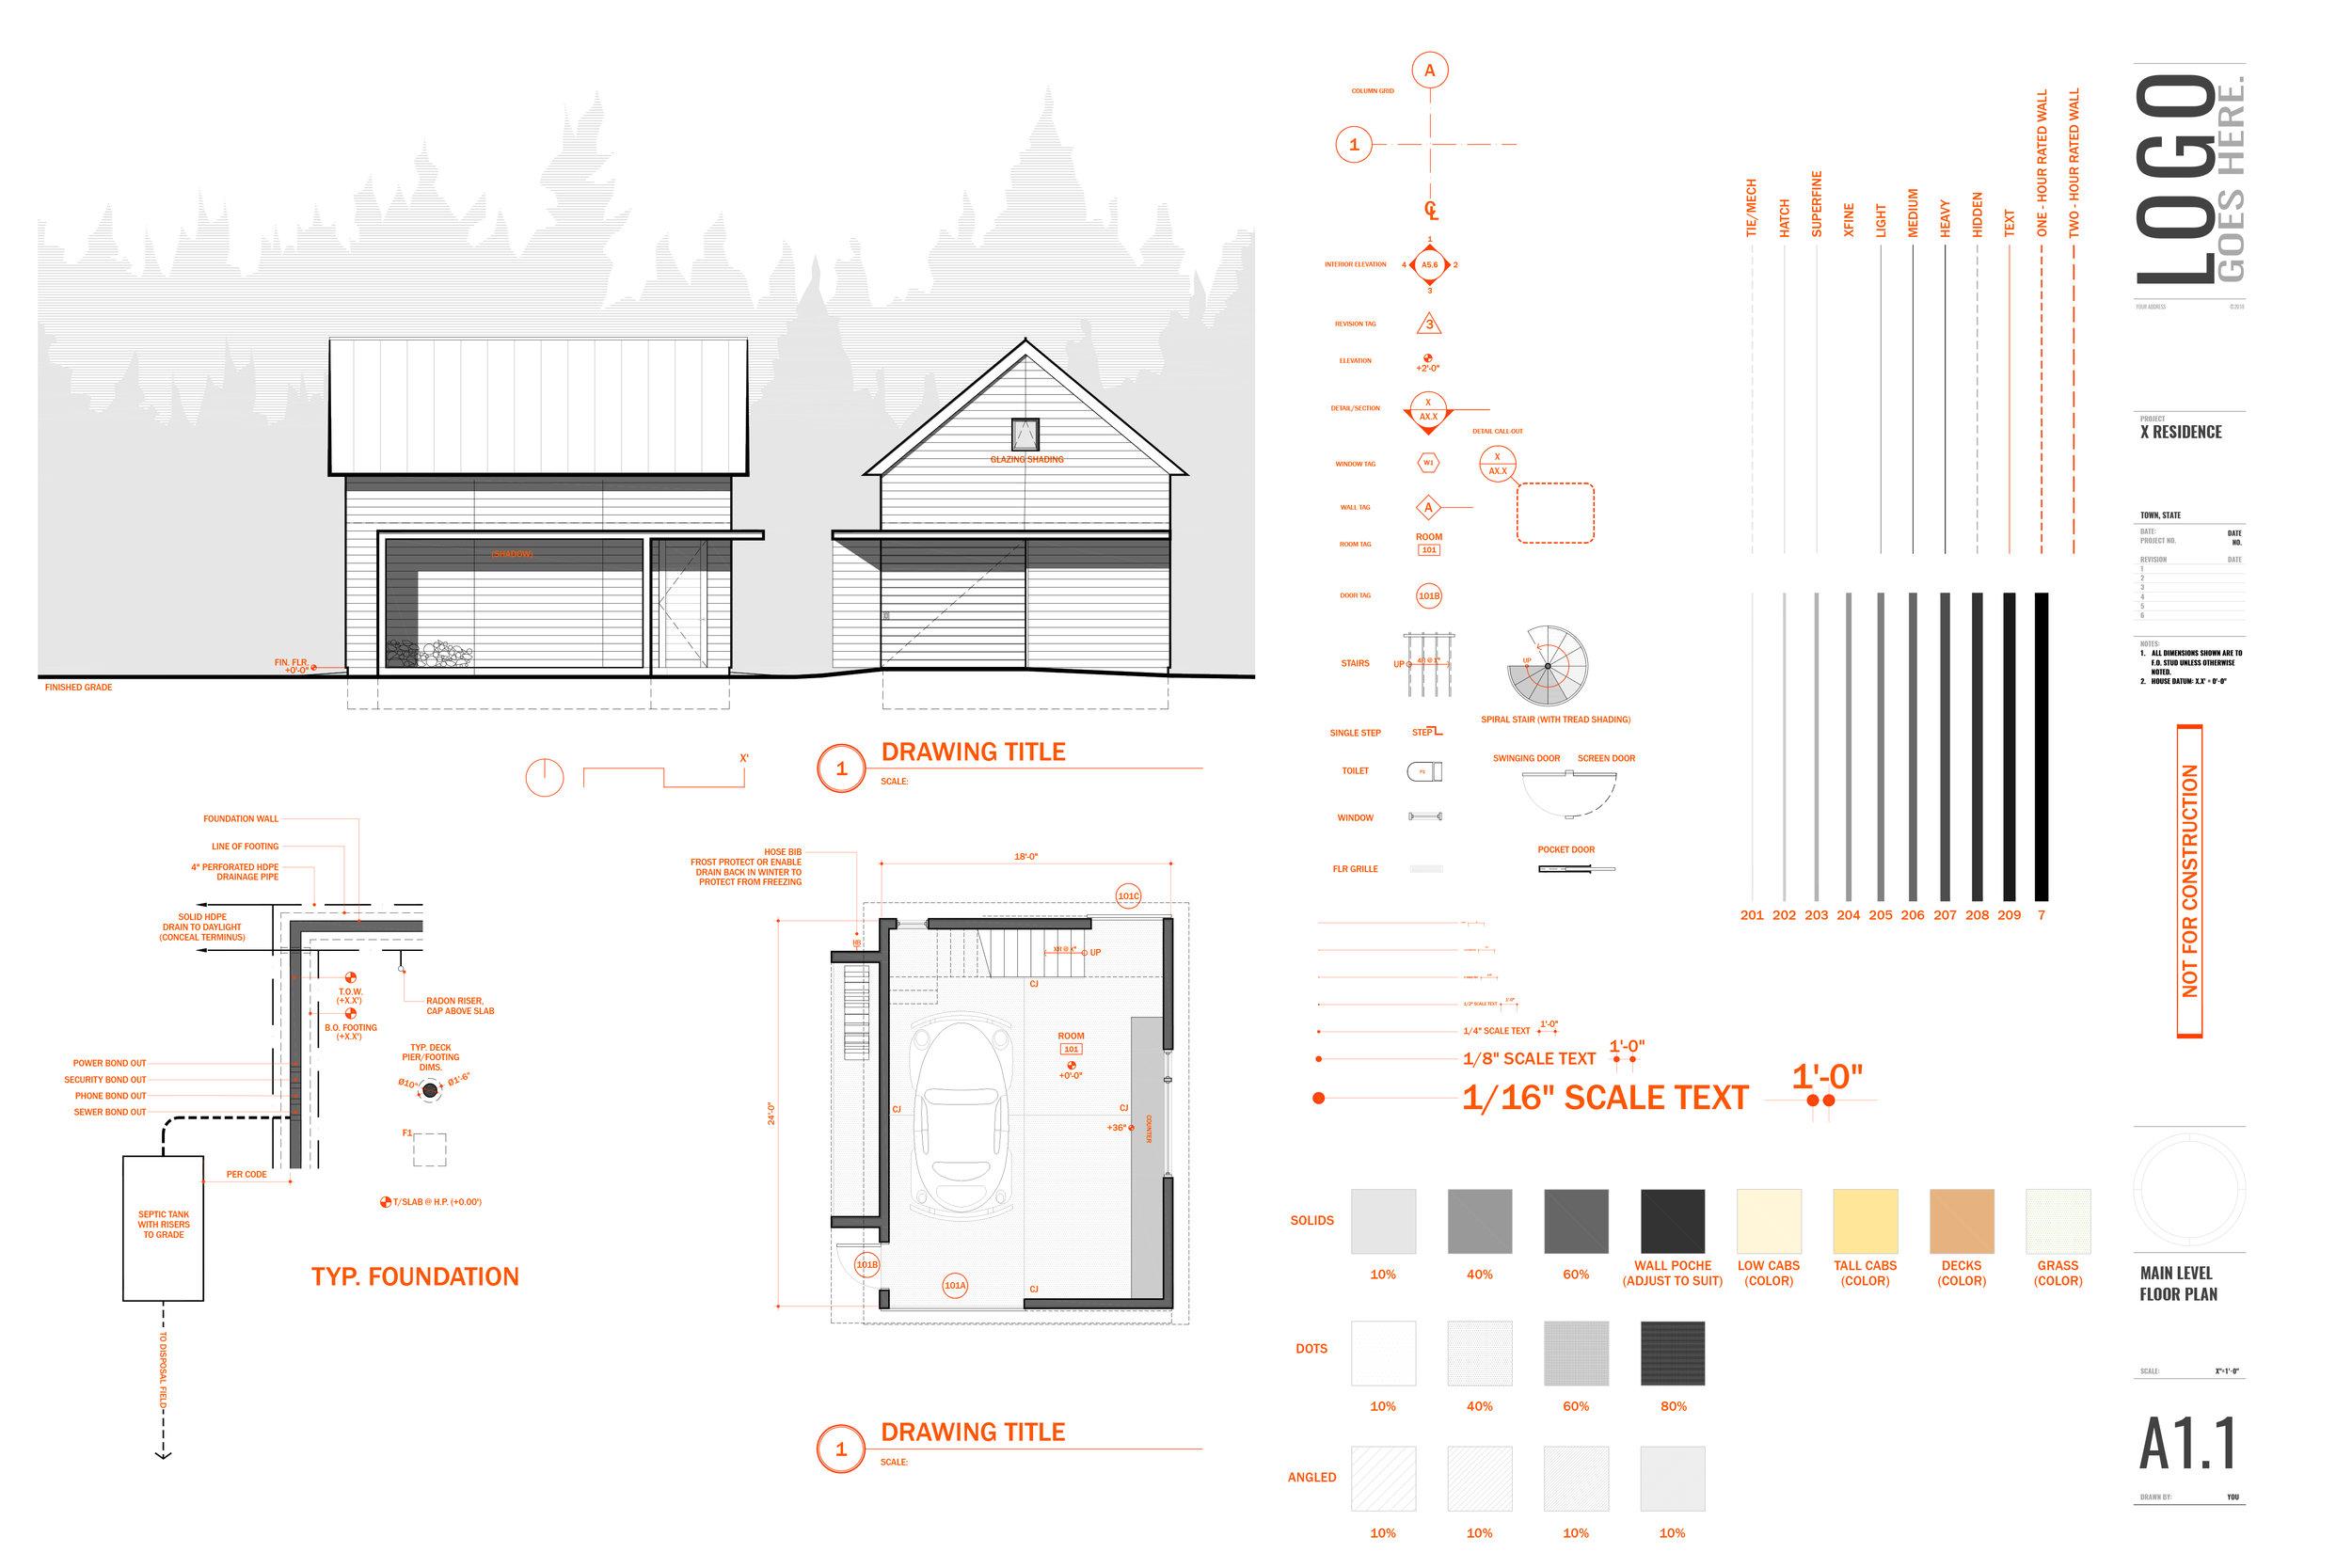 Architect and Entrepreneur Resources 30X40 Design Workshop